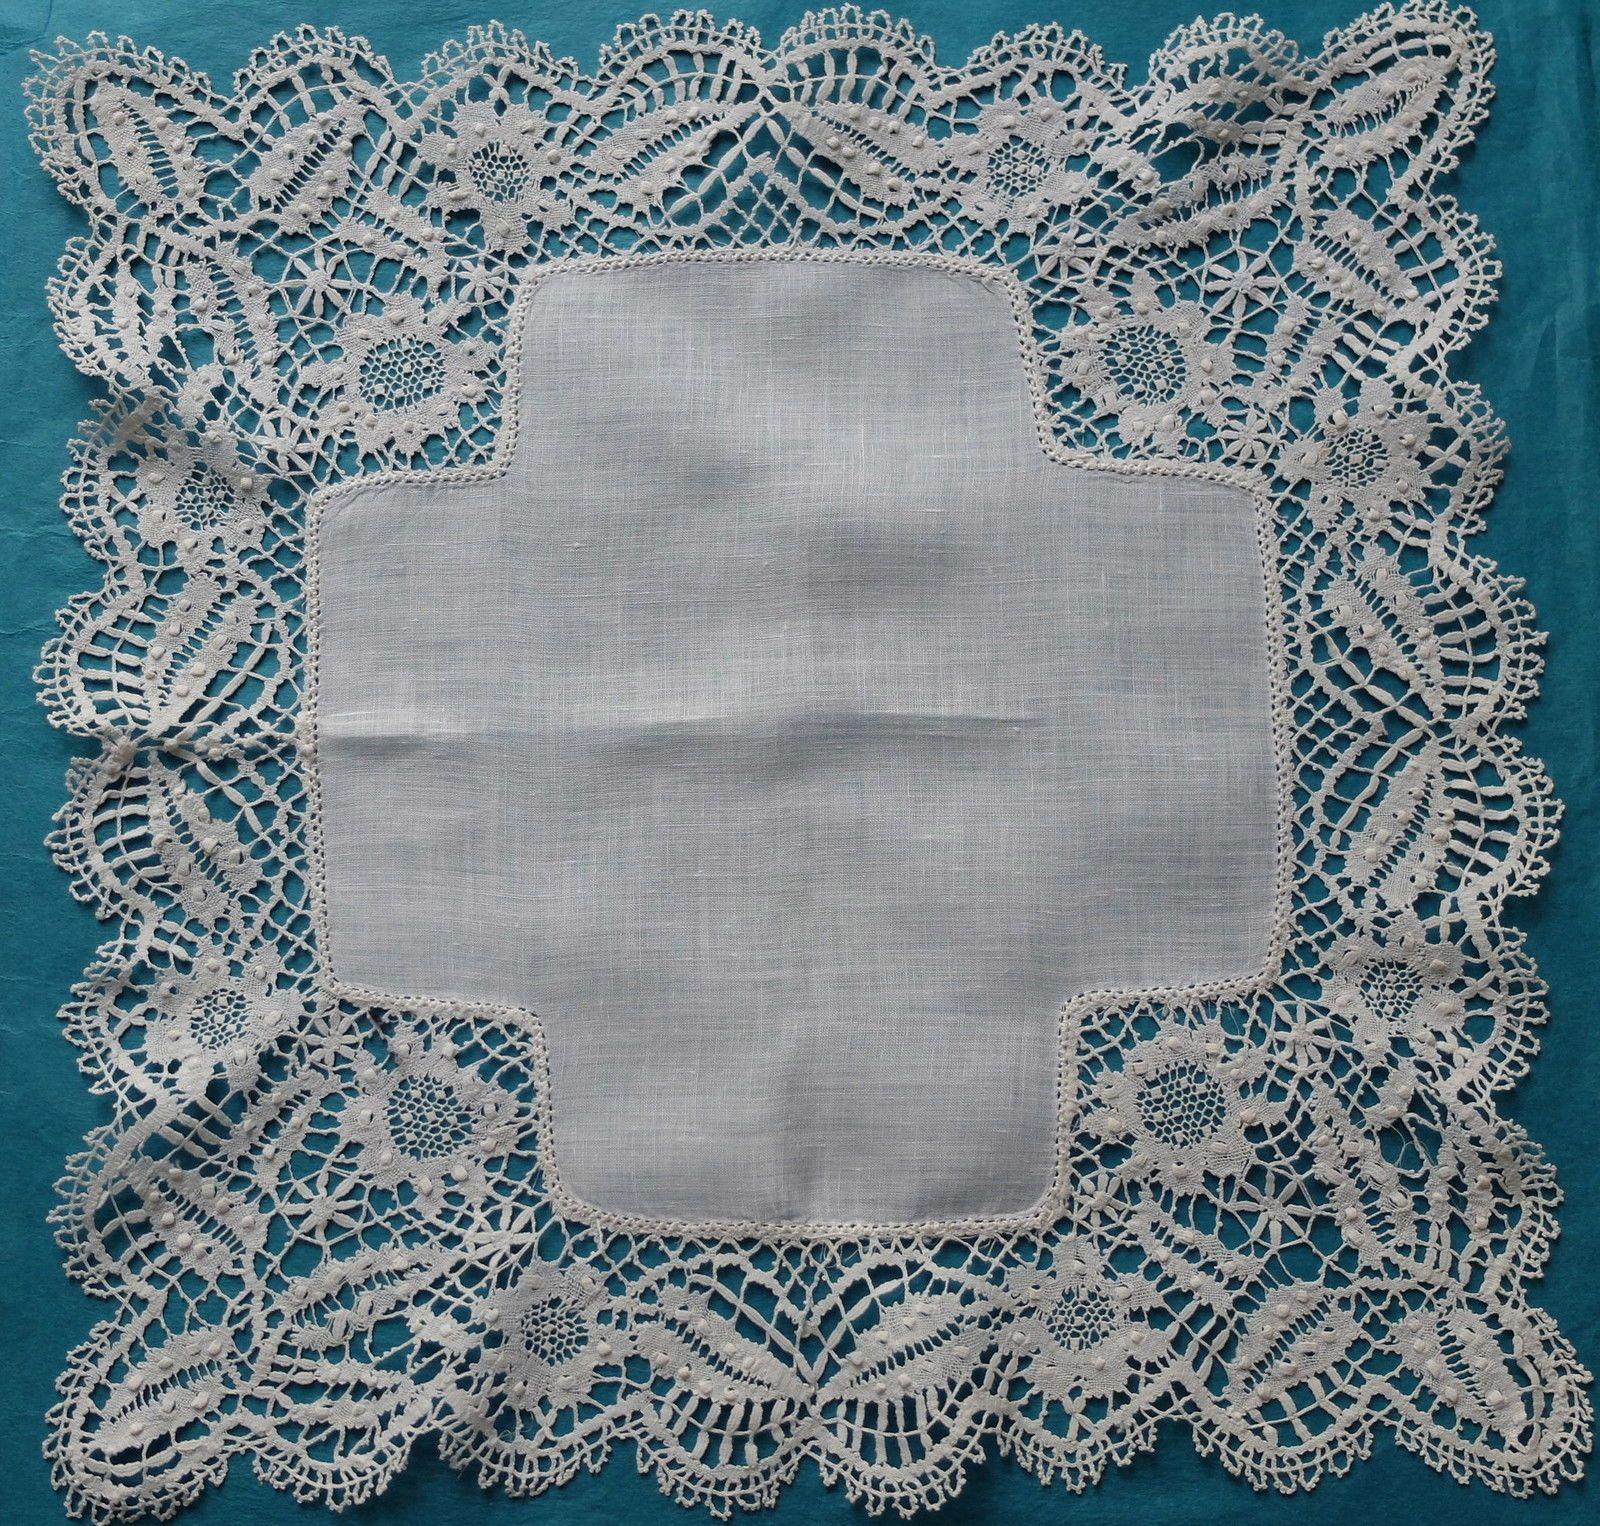 Antique Vintage Beds Lace Handkerchief | eBay